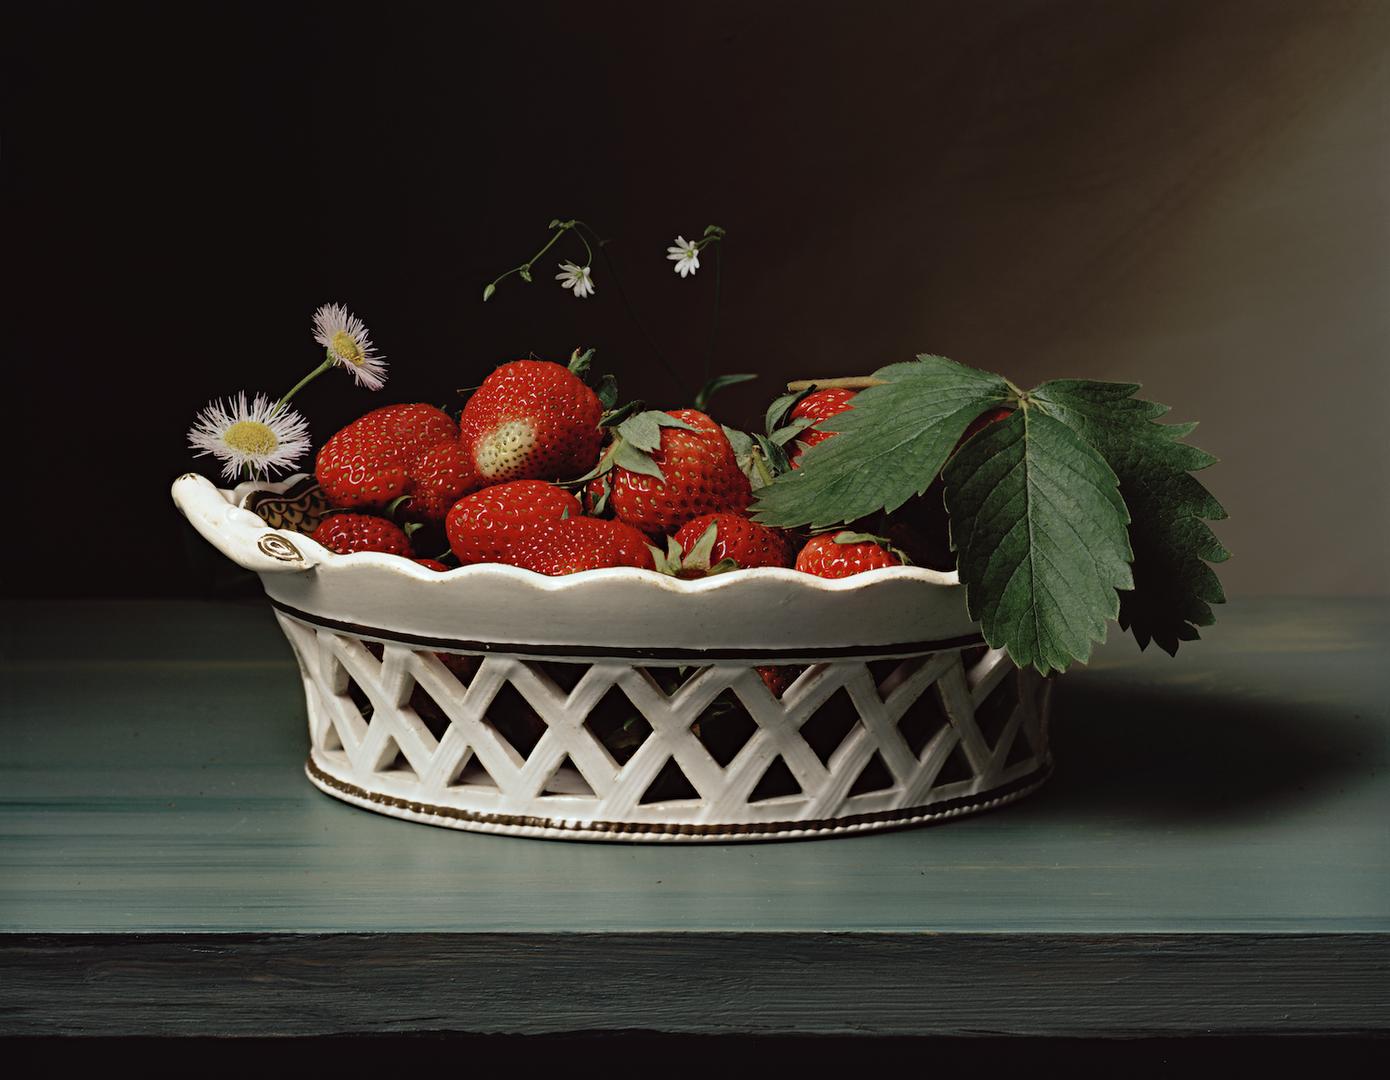 SharonCore_Strawberries.tif